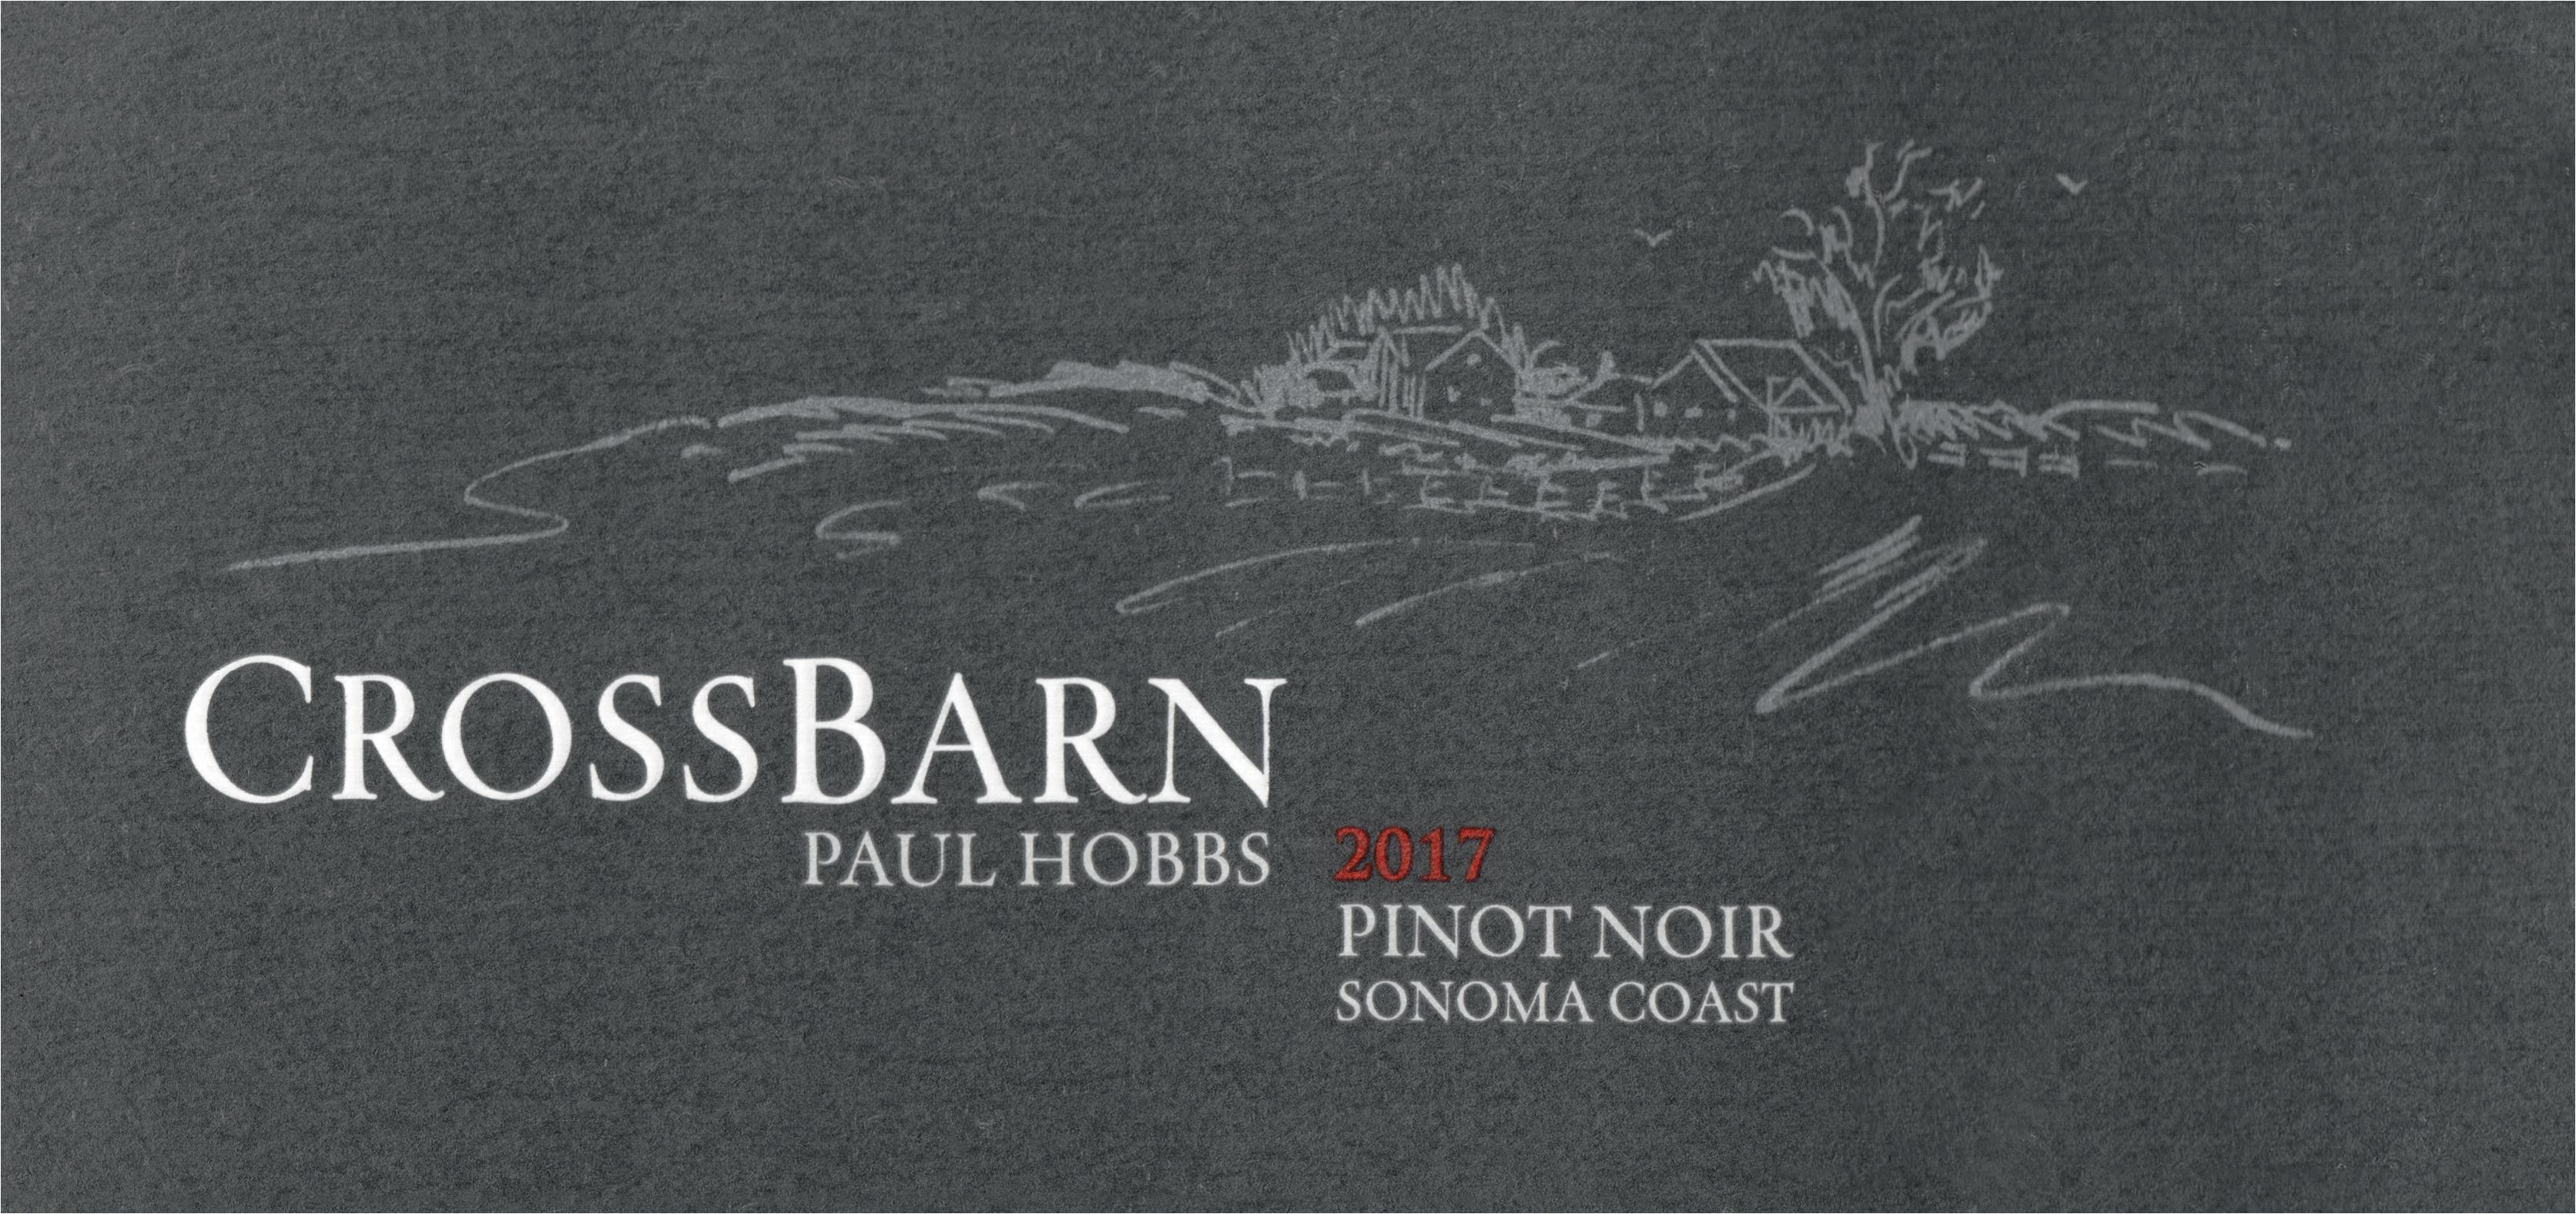 Crossbarn Pinot Noir 2017